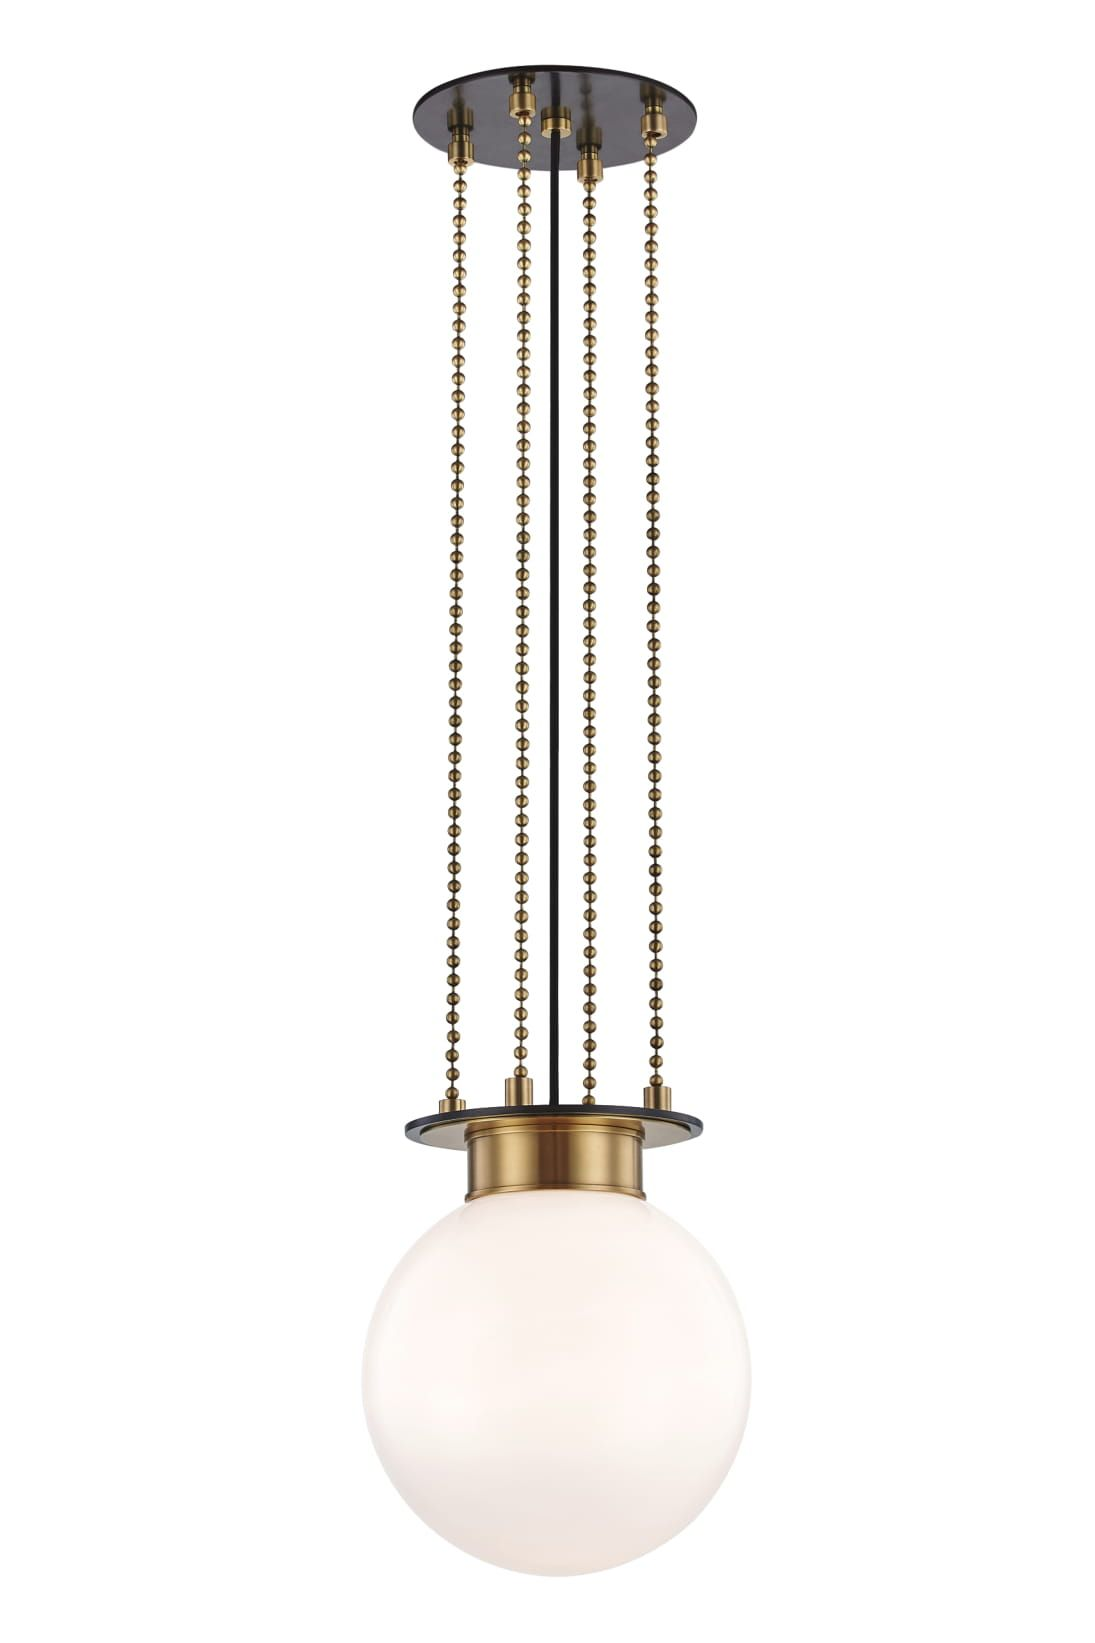 Gunther 1 Light Small Pendant Aob Hudson Valley Lighting